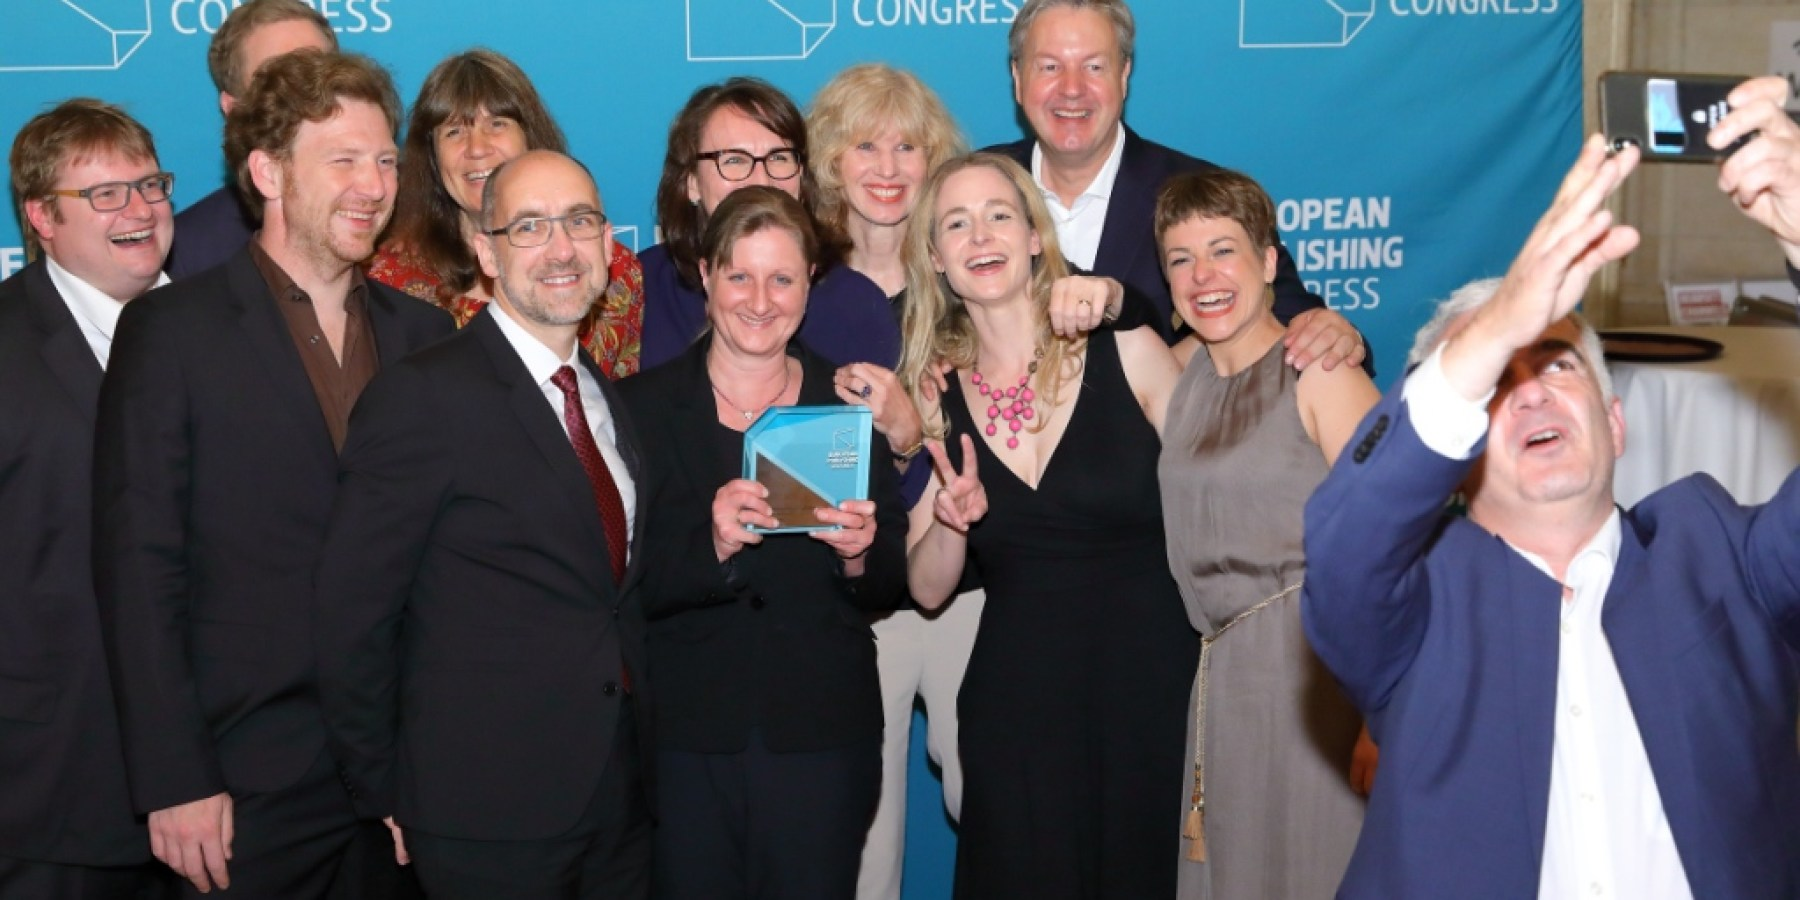 Apotheken-Umschau.de ist European Digital Publishing Platform of the Year